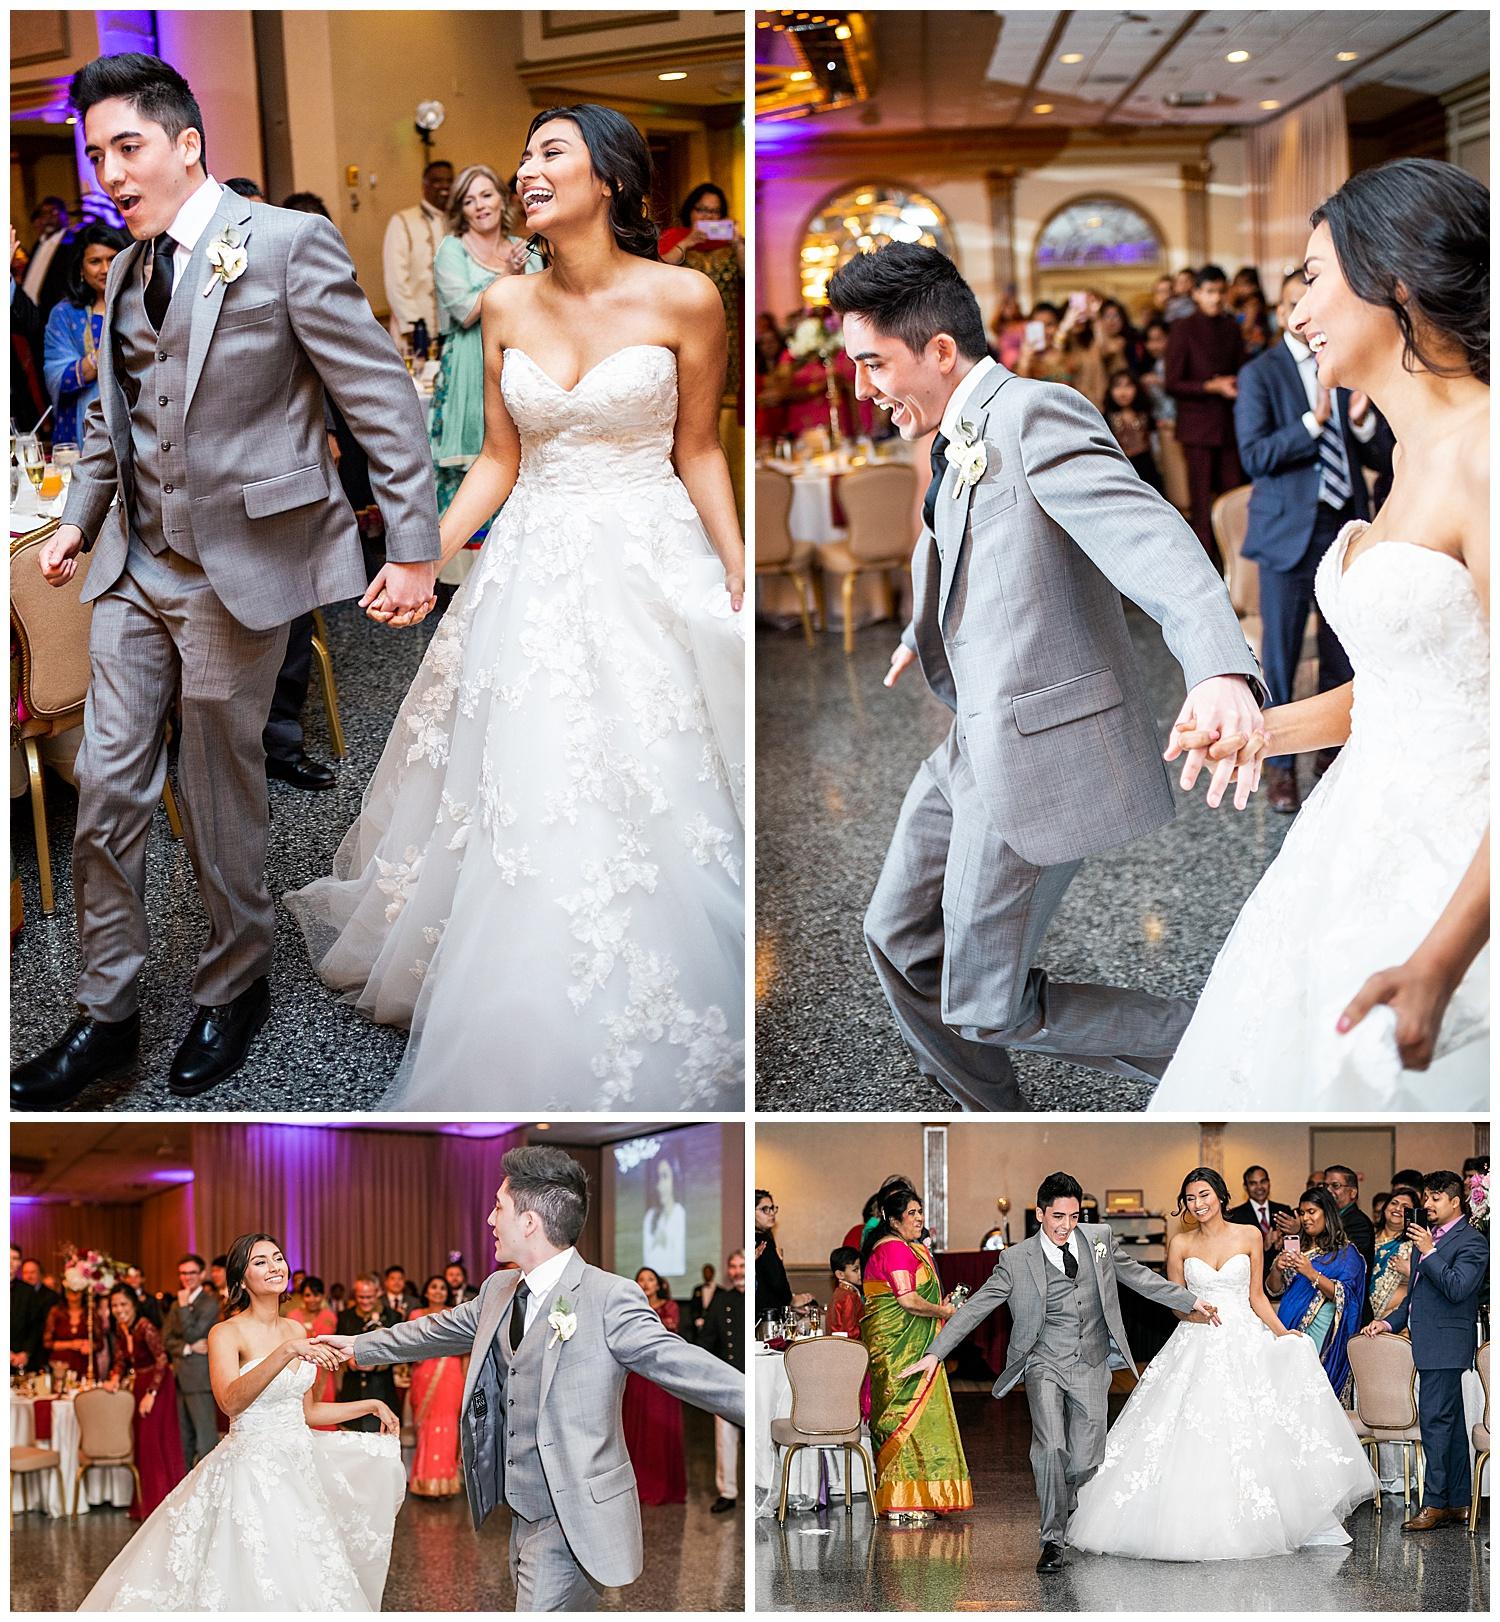 J+L Martins West Indian Wedding Living Radiant Photography photos_0069.jpg